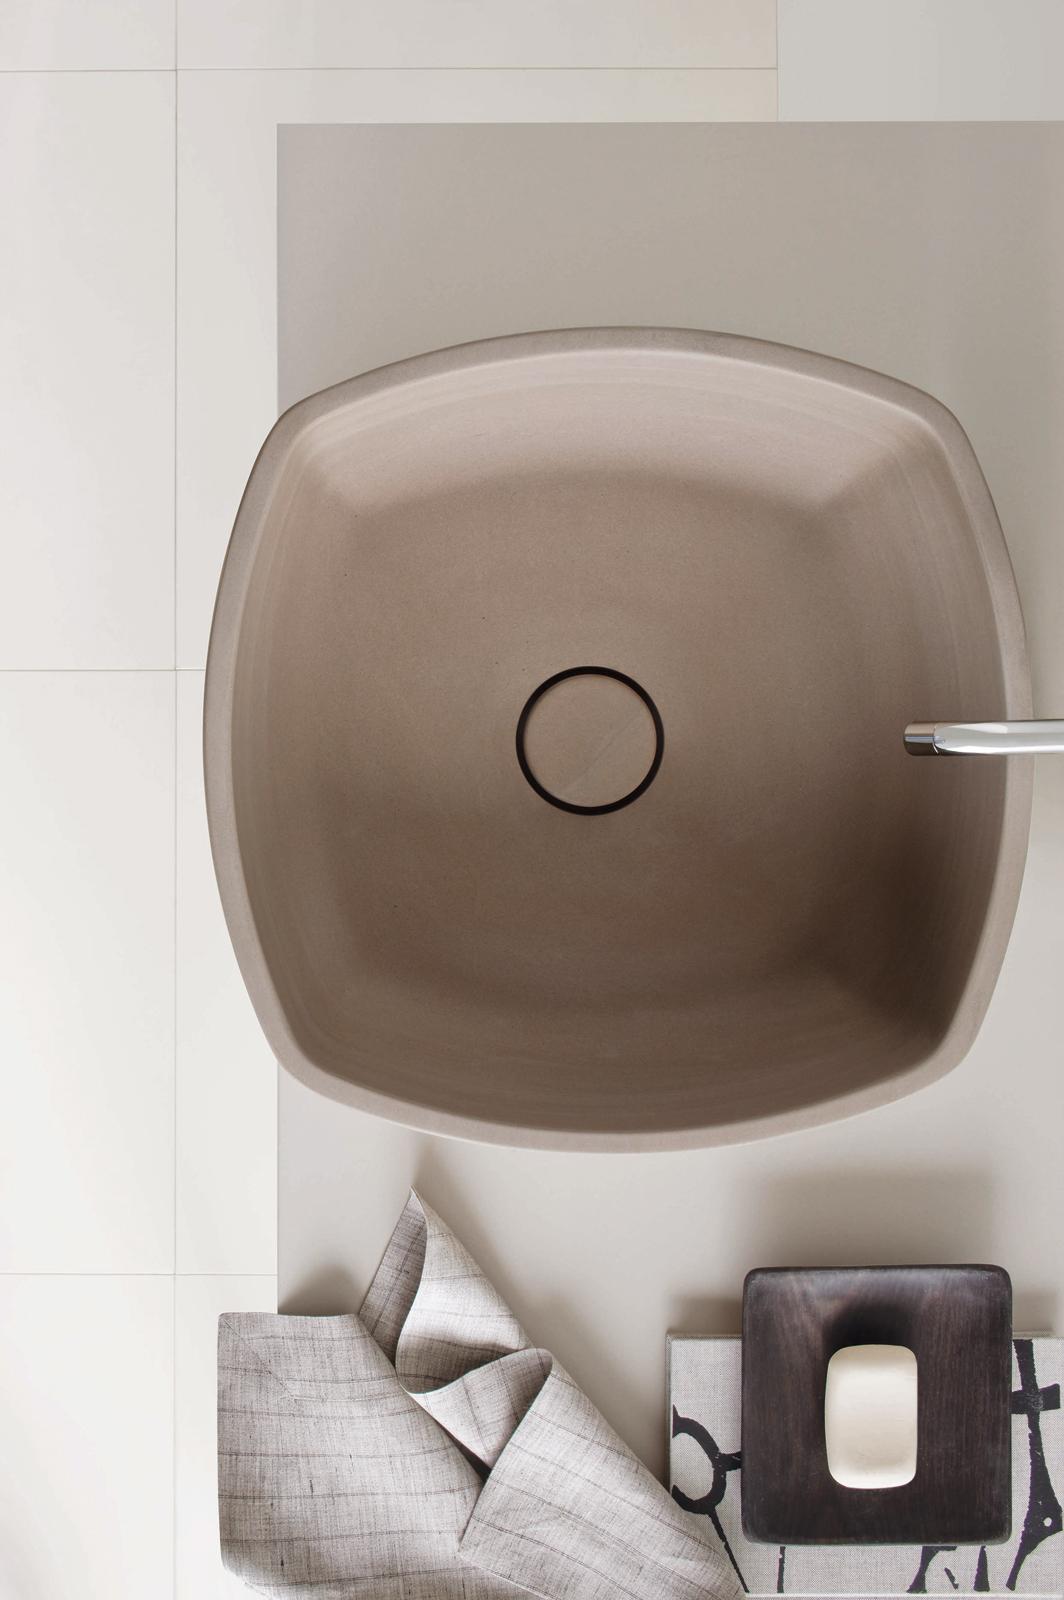 Inkstone wash-basin in Sand Brown stone.